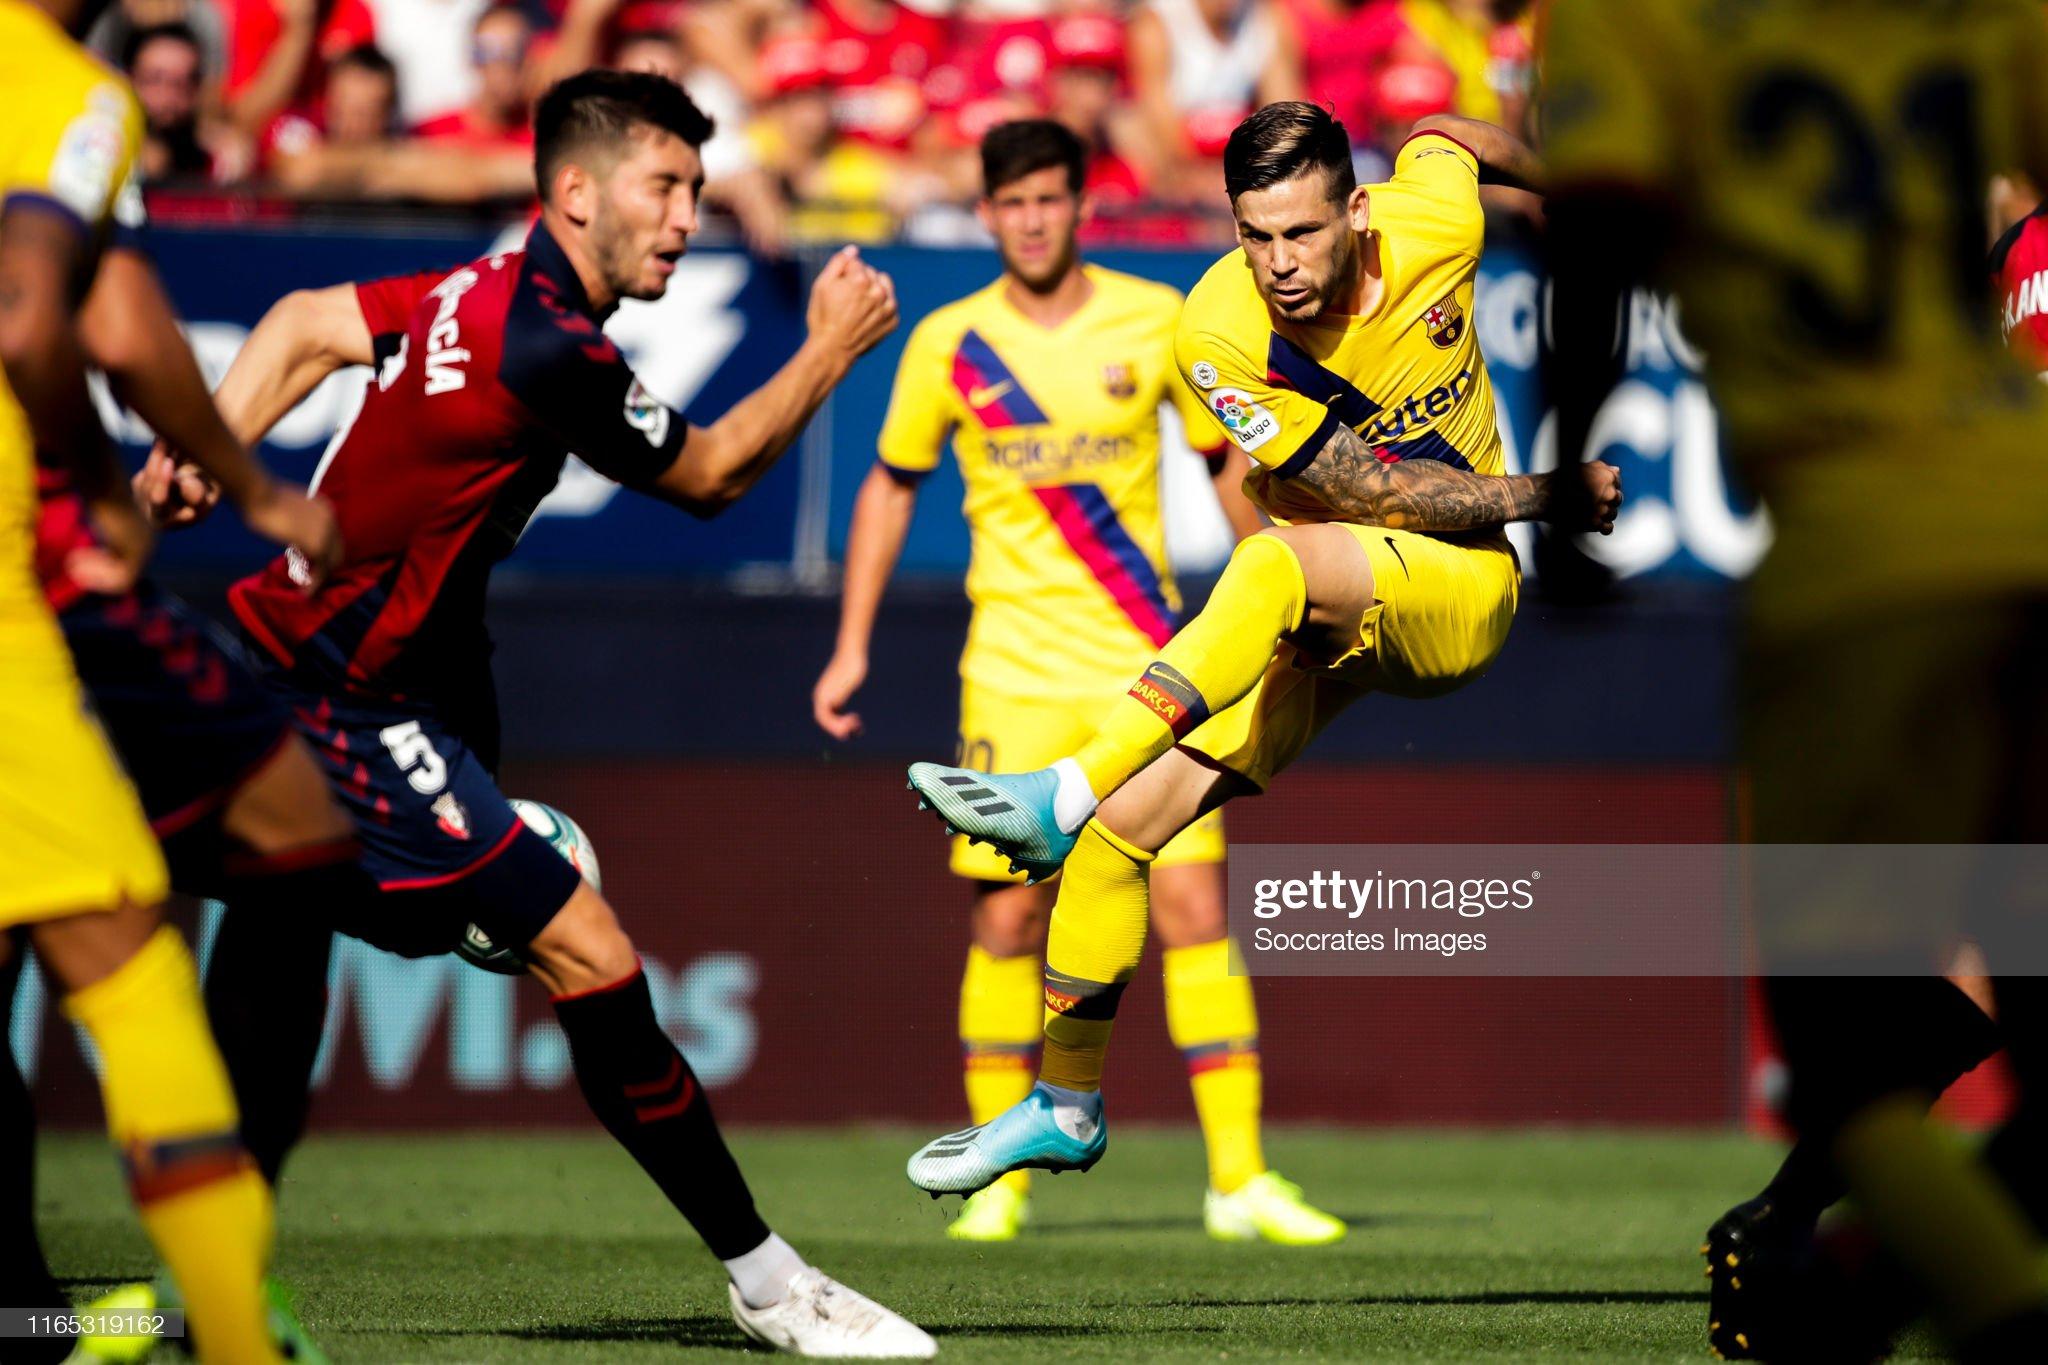 صور مباراة : أوساسونا - برشلونة 2-2 ( 31-08-2019 )  Carles-perez-of-fc-barcelona-during-the-la-liga-santander-match-v-picture-id1165319162?s=2048x2048